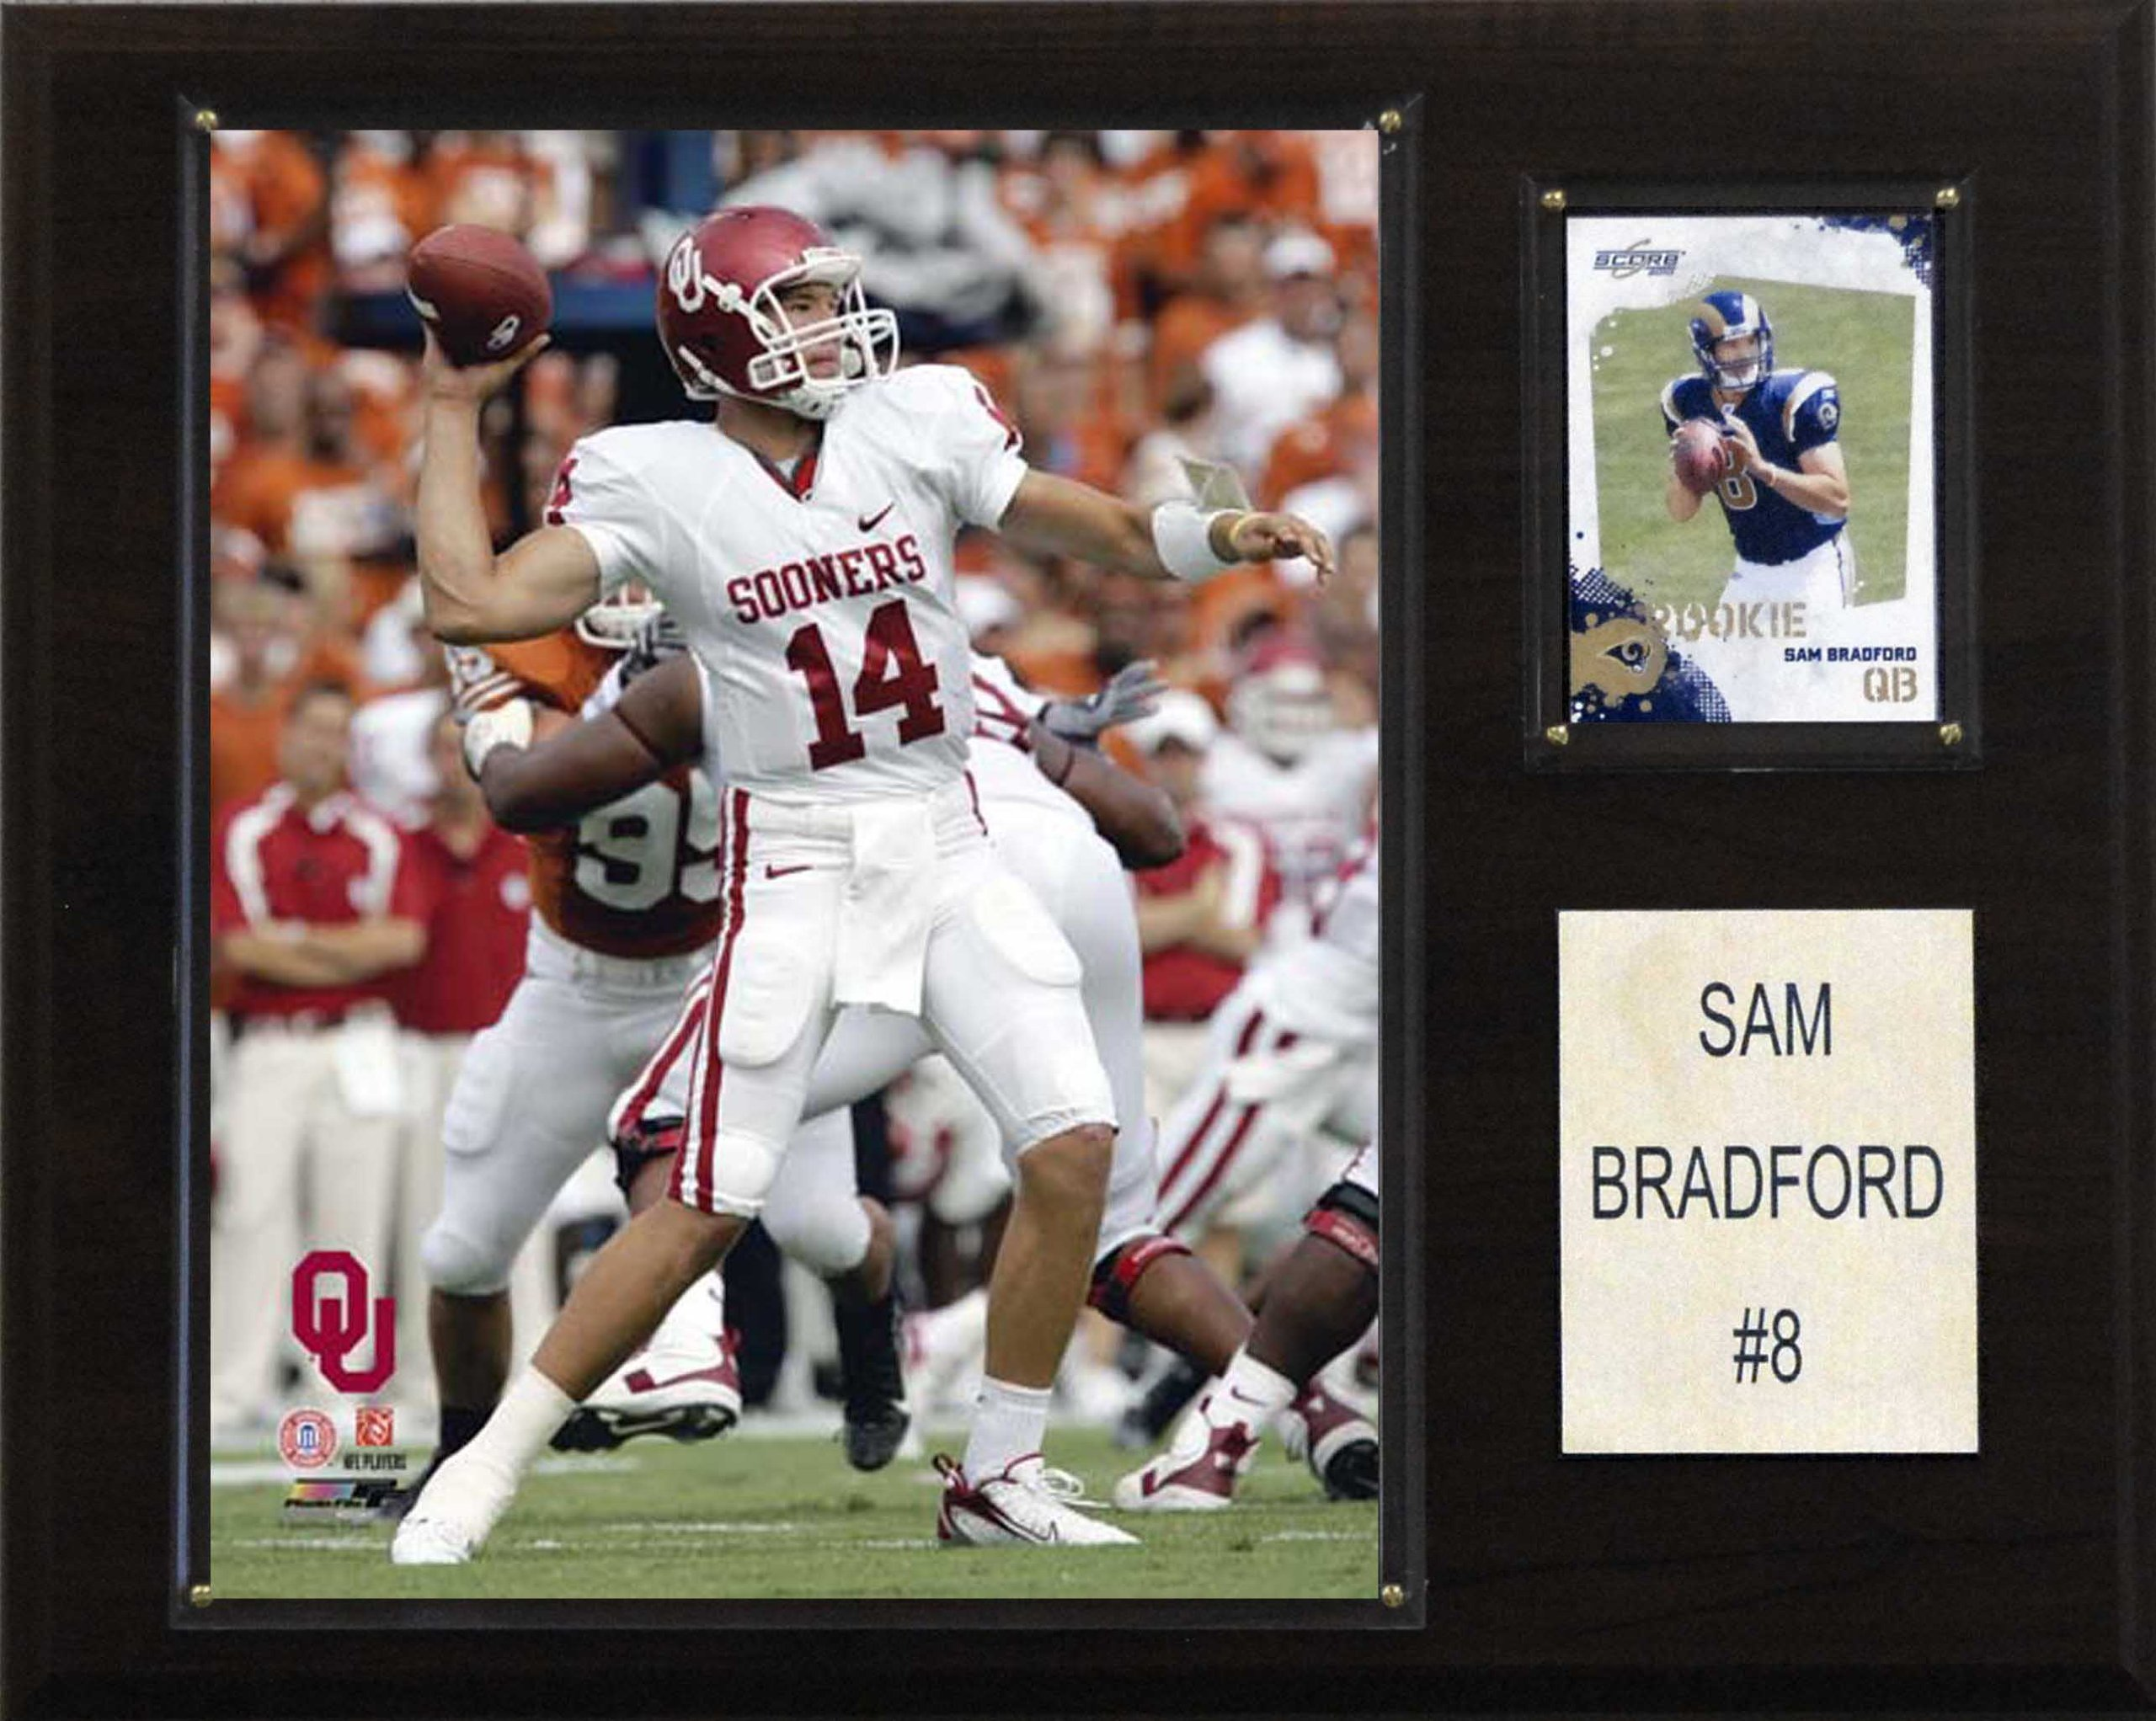 NCAA Football Sam Bradford Oklahoma Sooners Player Plaque